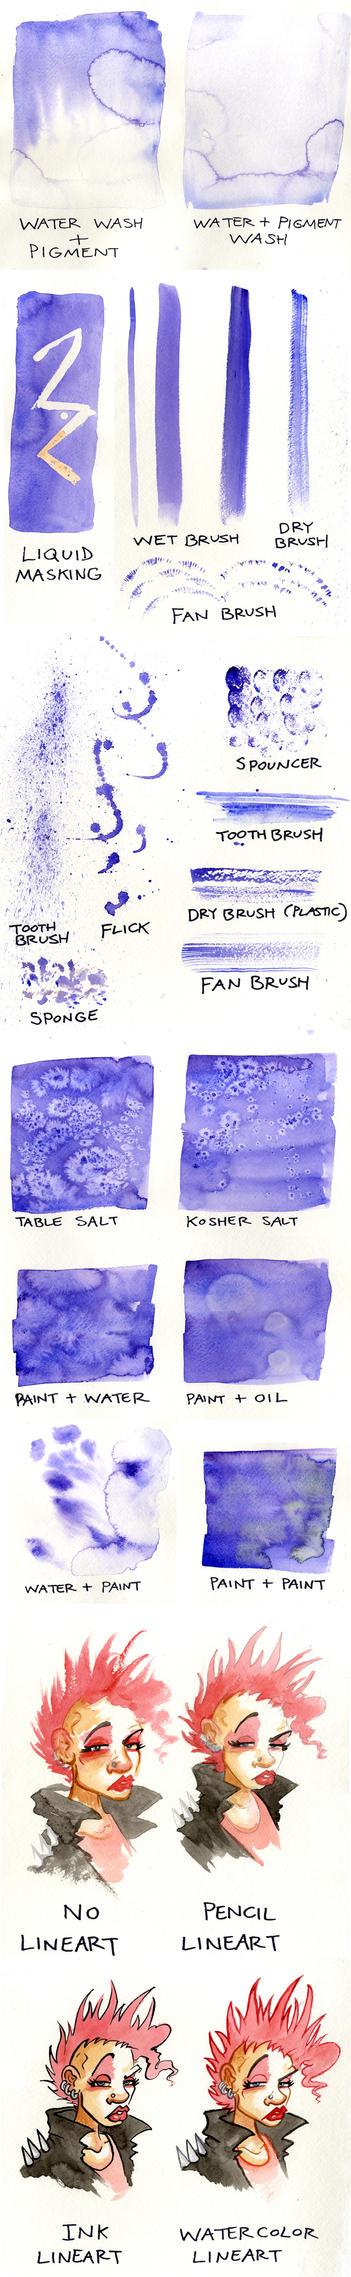 Watercolor Techniques by JoJo-Seames